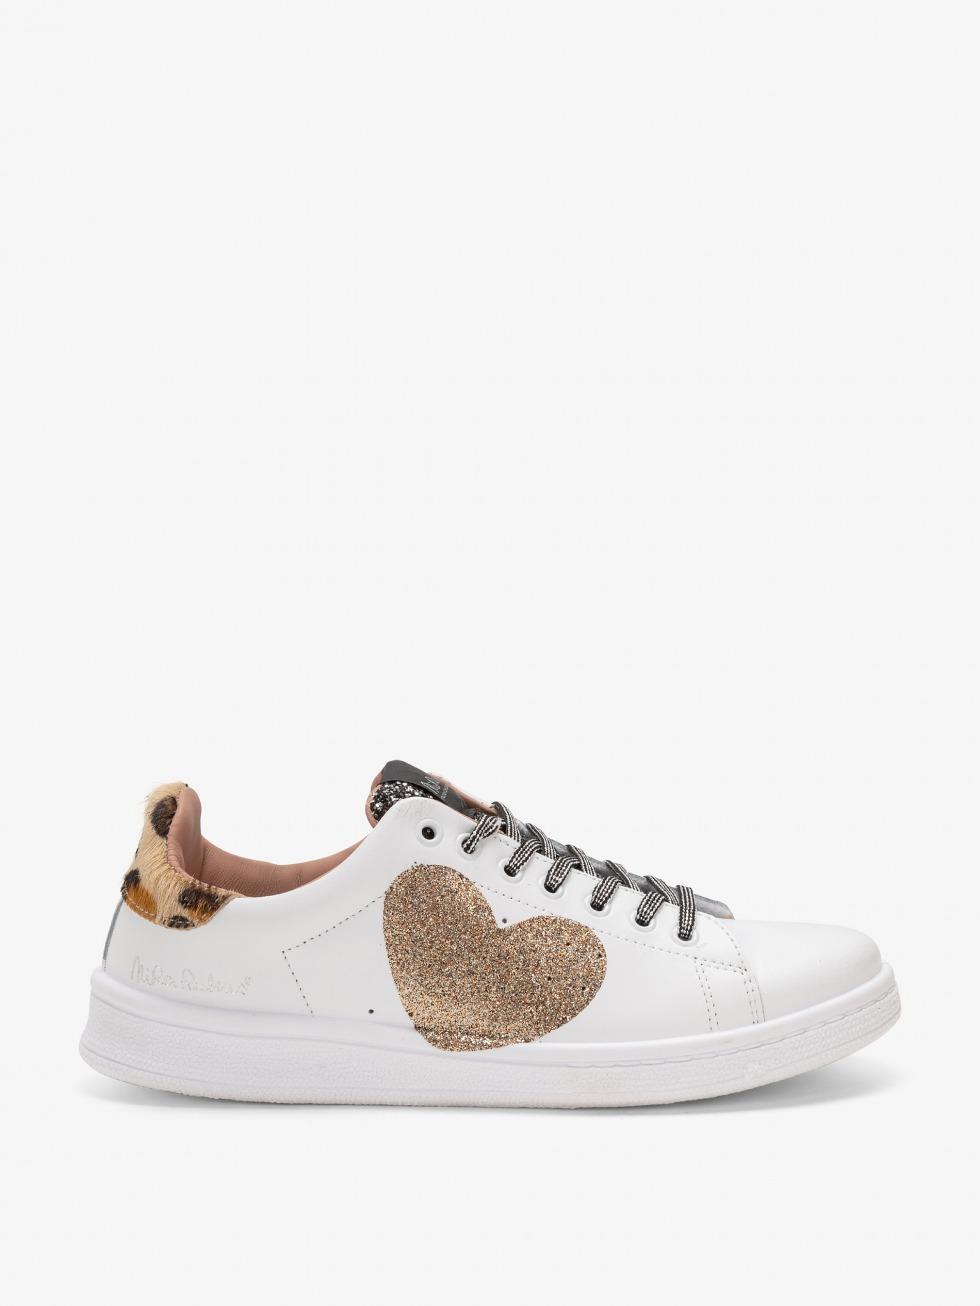 Daiquiri Africa Sneakers - Gold Heart